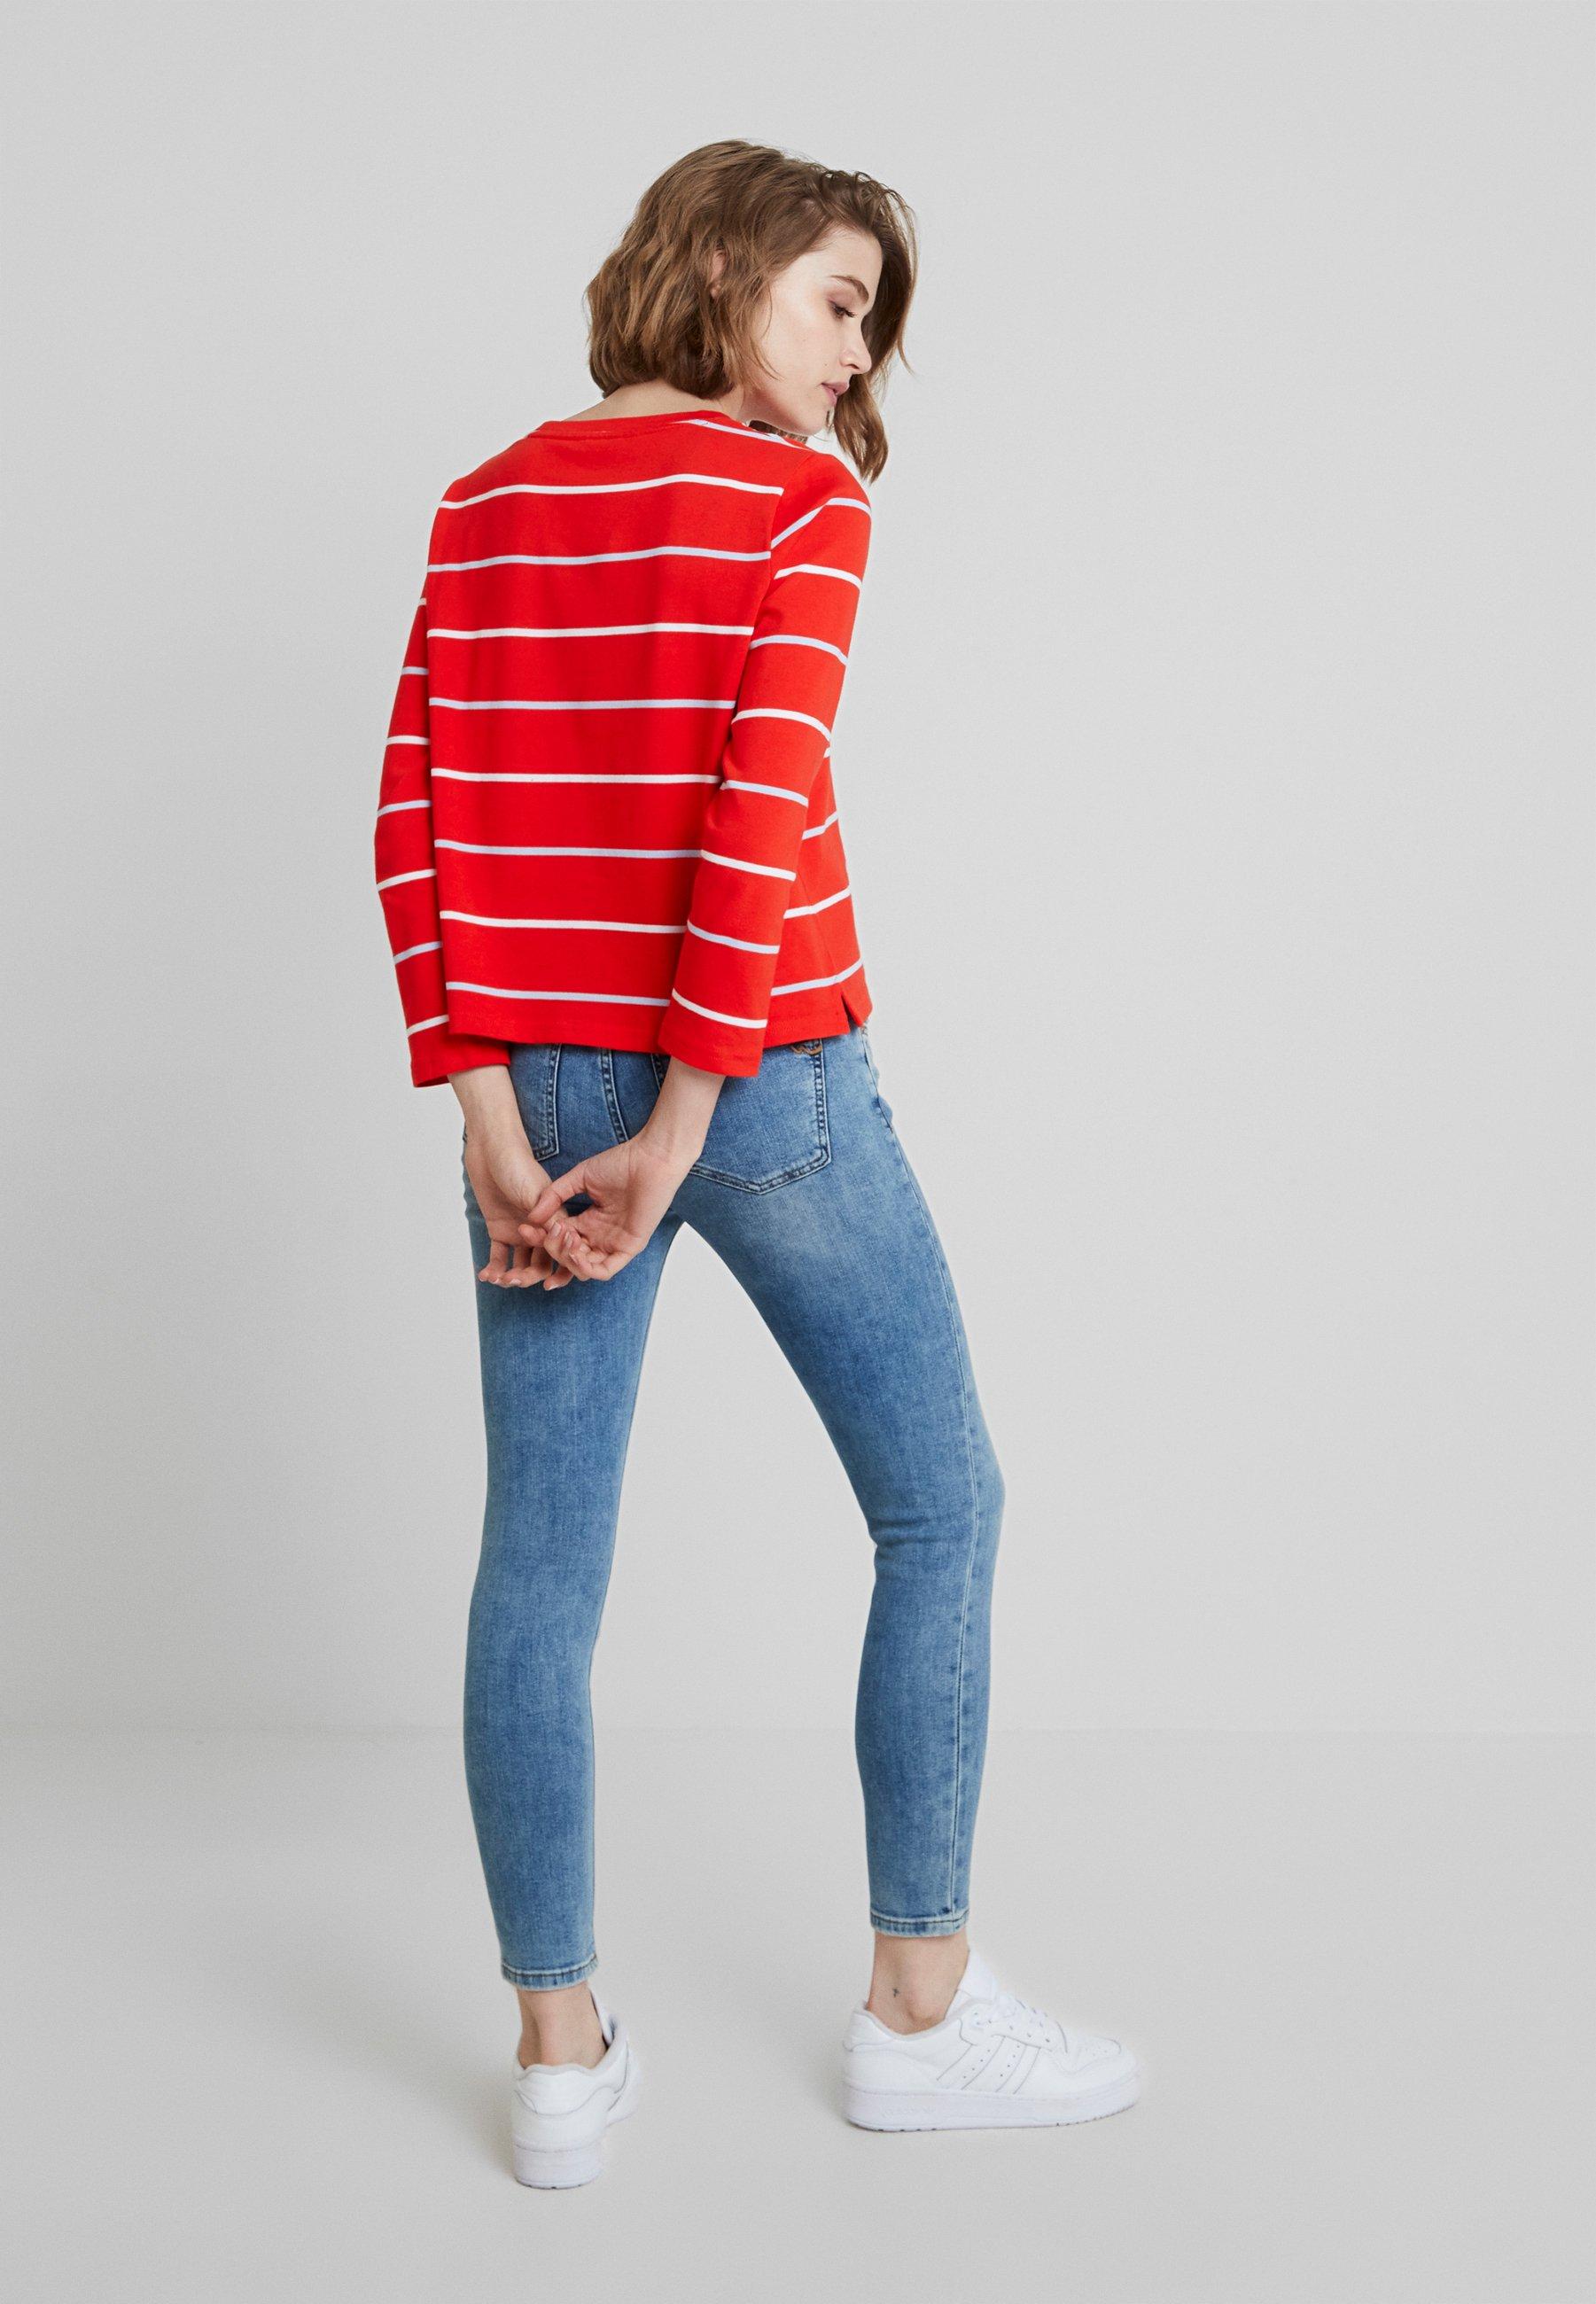 Banana Tee À Manches Red shirt Longues Skimmer StripesT Republic vwmN8nO0